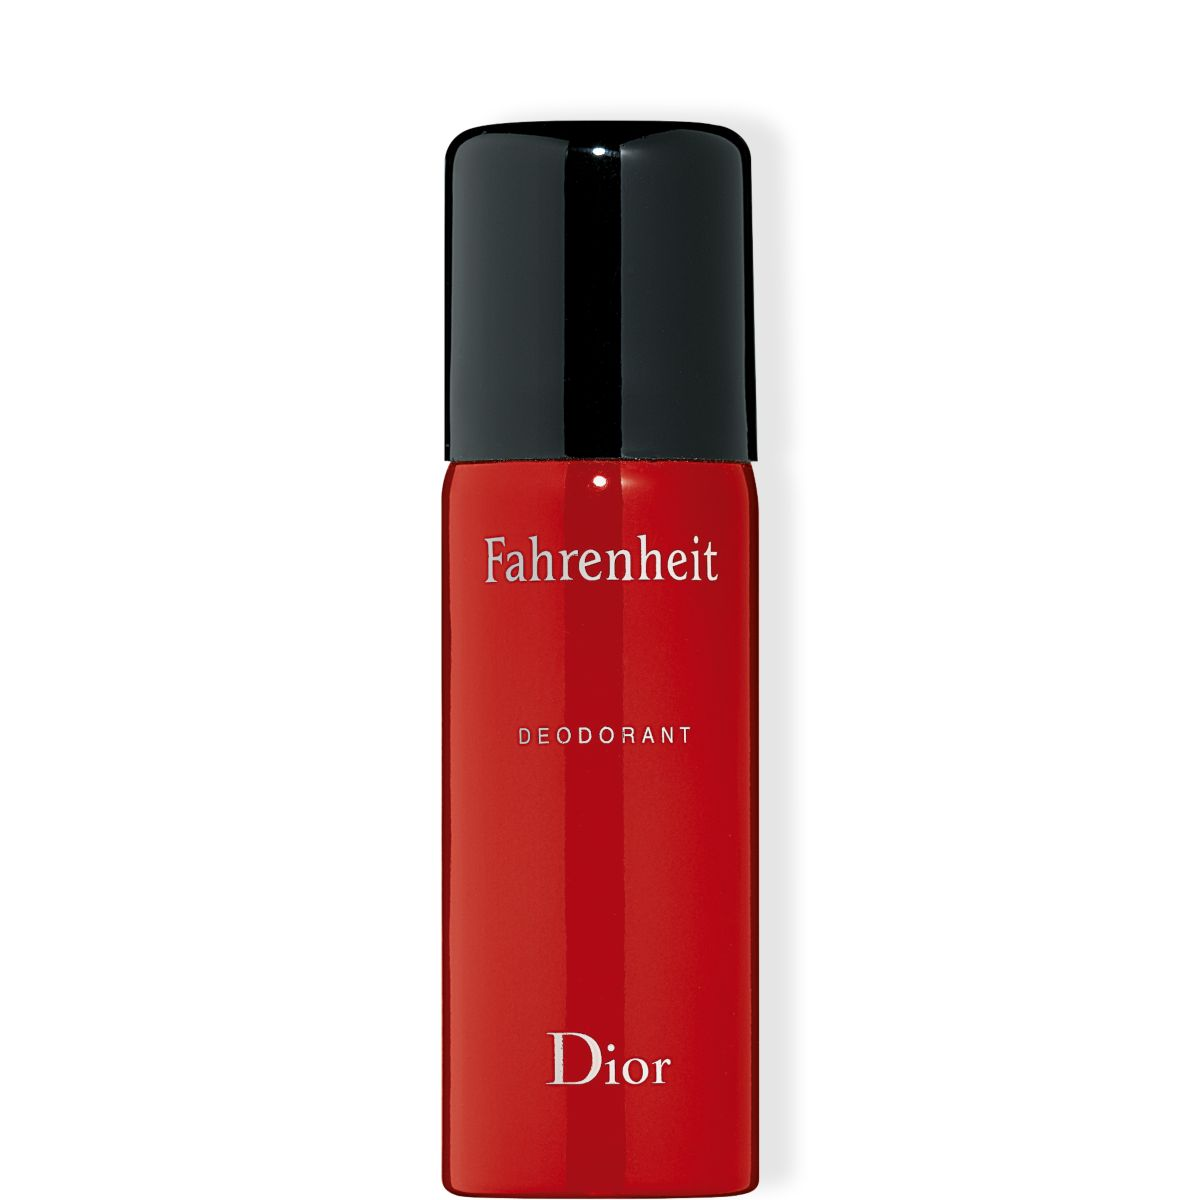 Dior - Fahrenheit - Déodorant Vaporisateur 150 ml